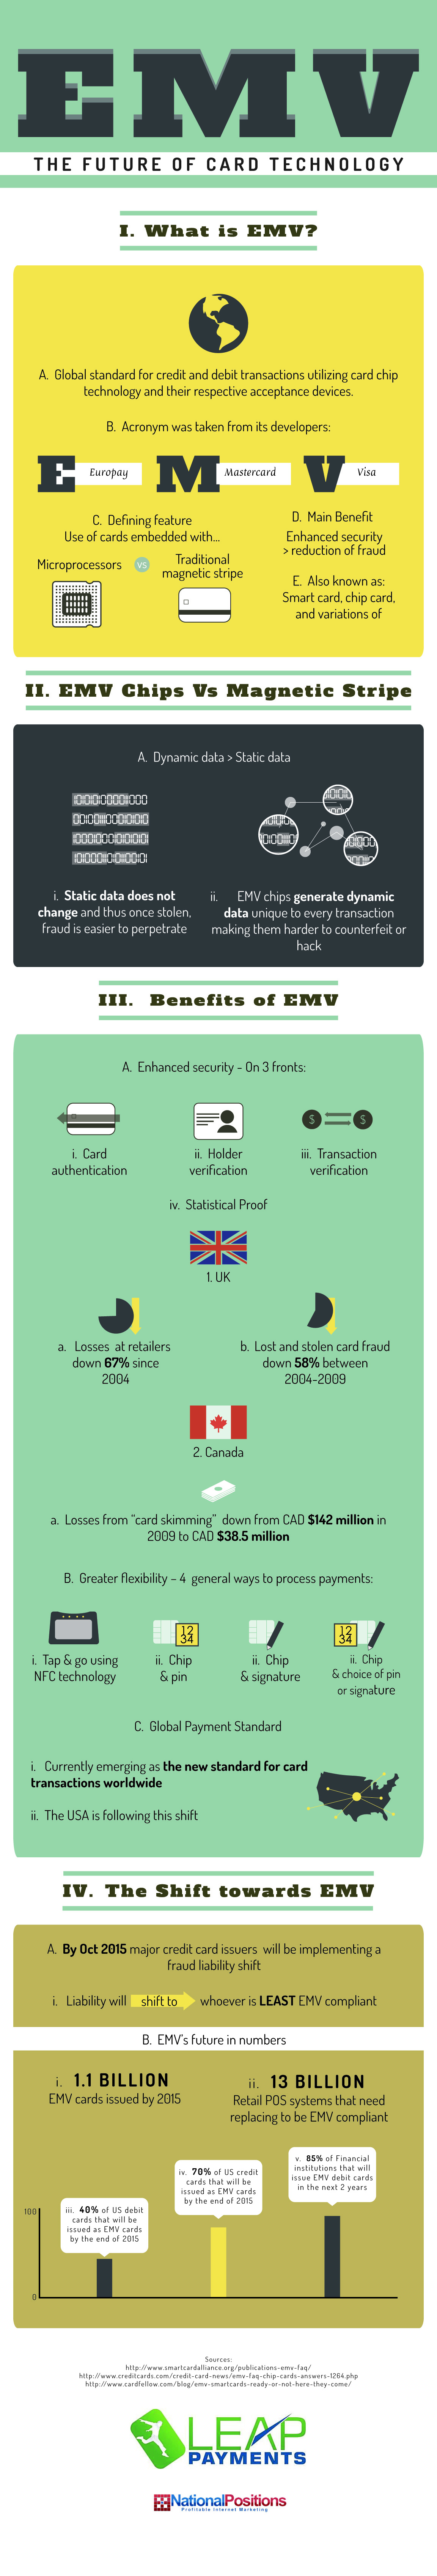 EMV Card Technology